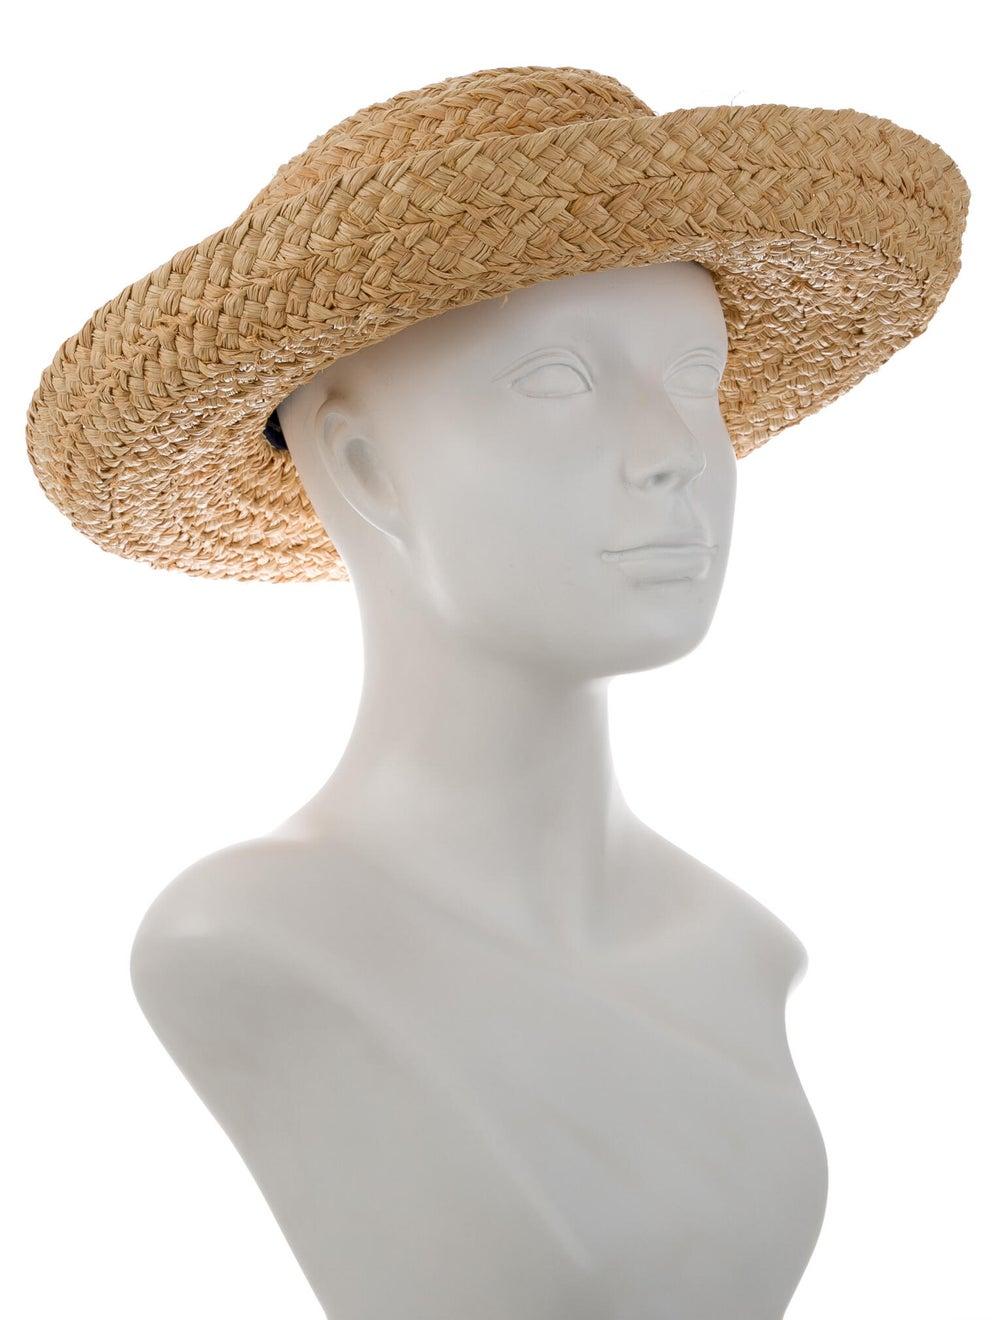 Kaminski Woven Straw Wide-Brim Hat Natural - image 3